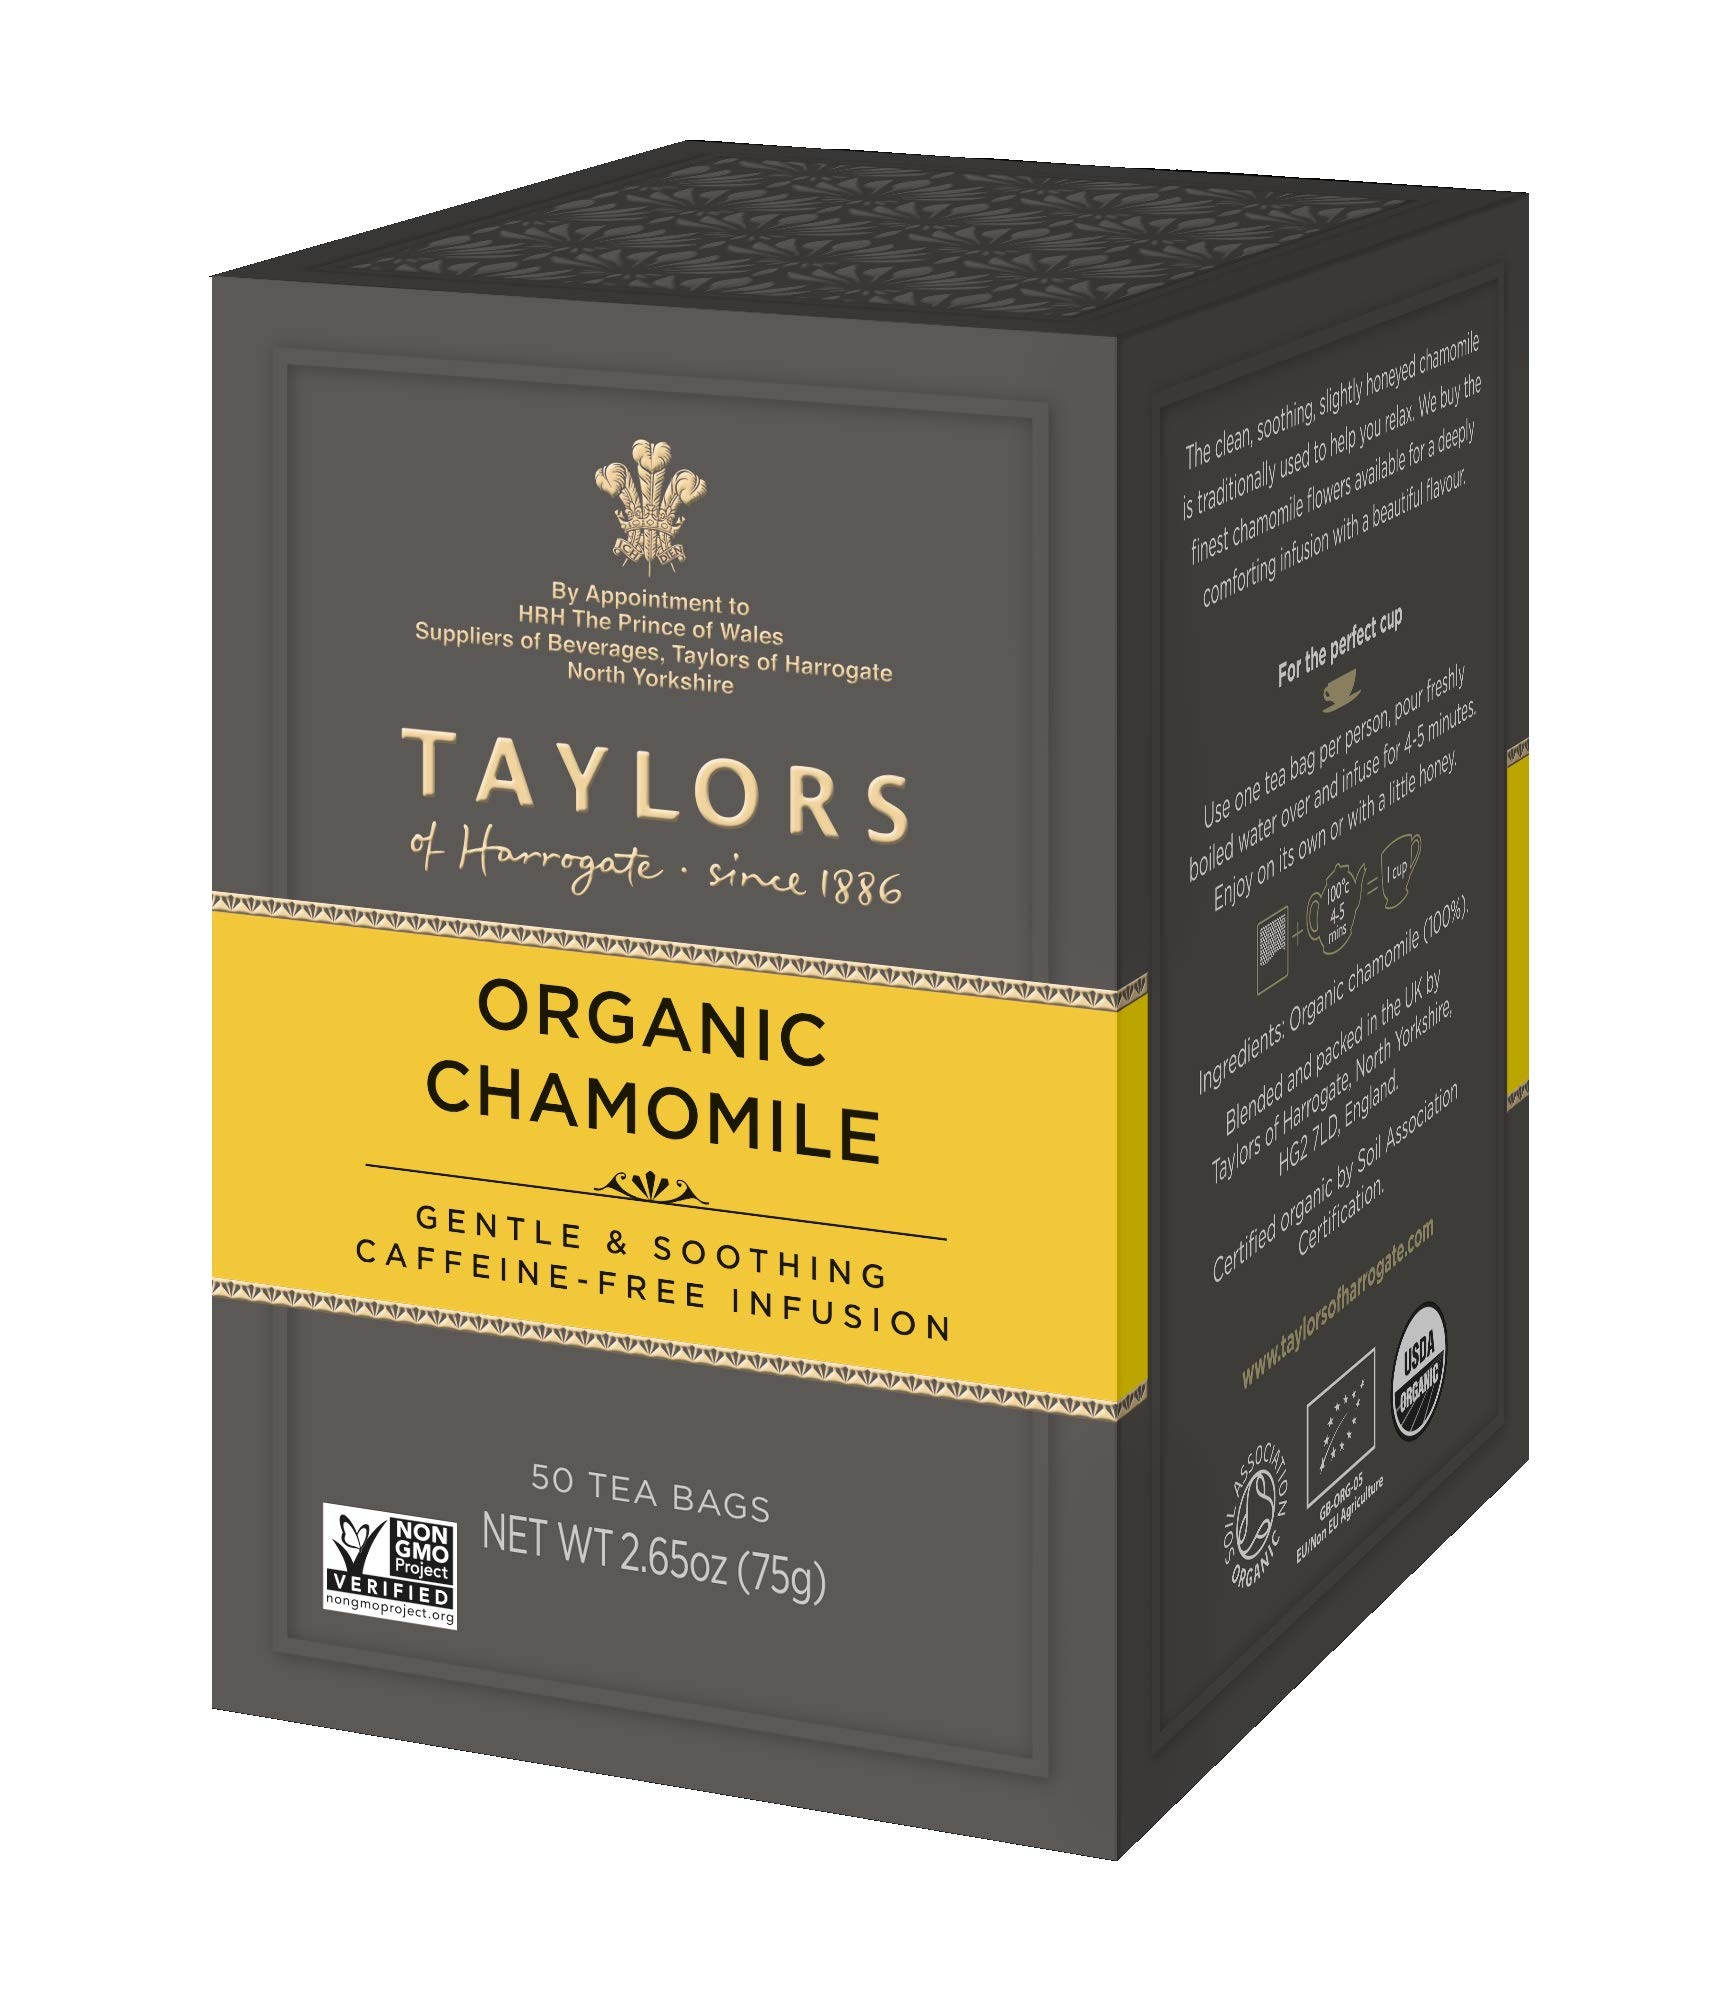 Taylors of Harrogate Organic Chamomile Herbal Tea, 50 Teabags (Pack of 6) by Taylors of Harrogate (Image #1)